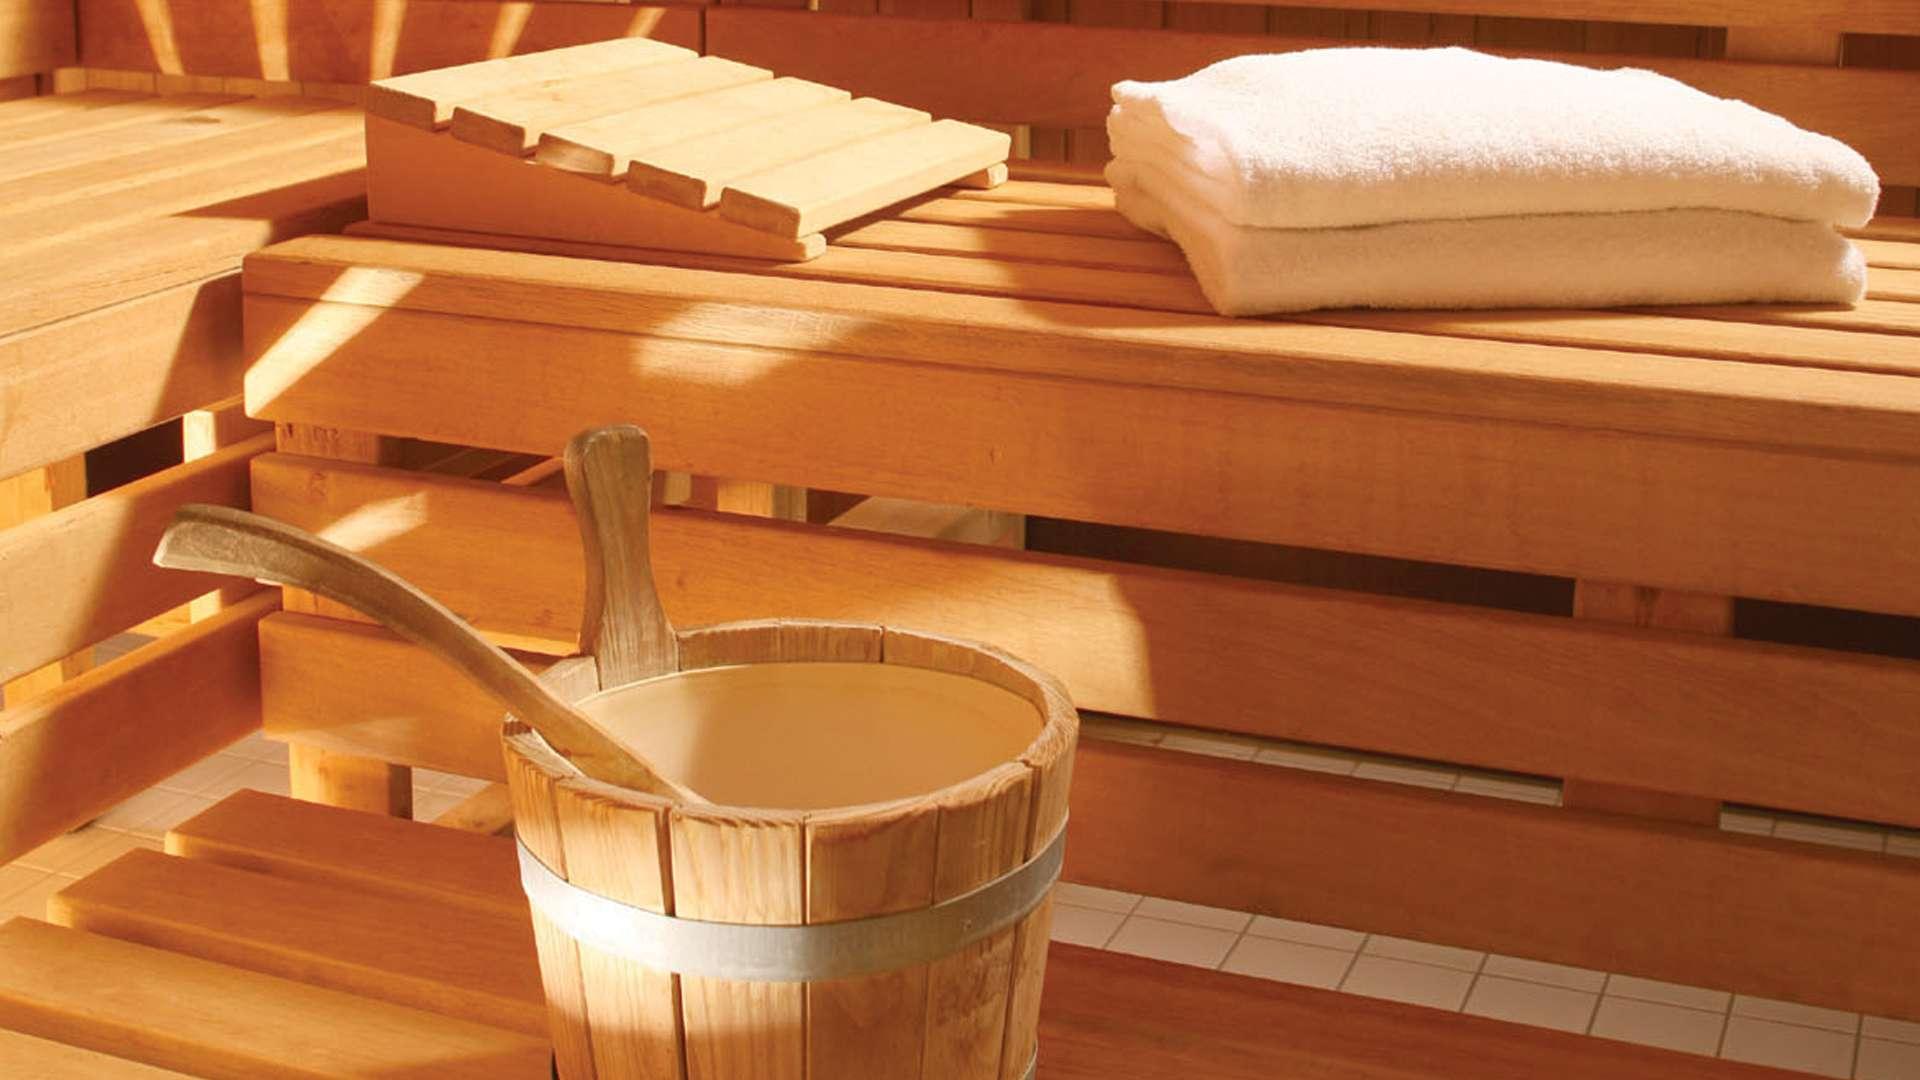 Un espace d tente sauna et hammam stationfitness for Espace sauna hammam